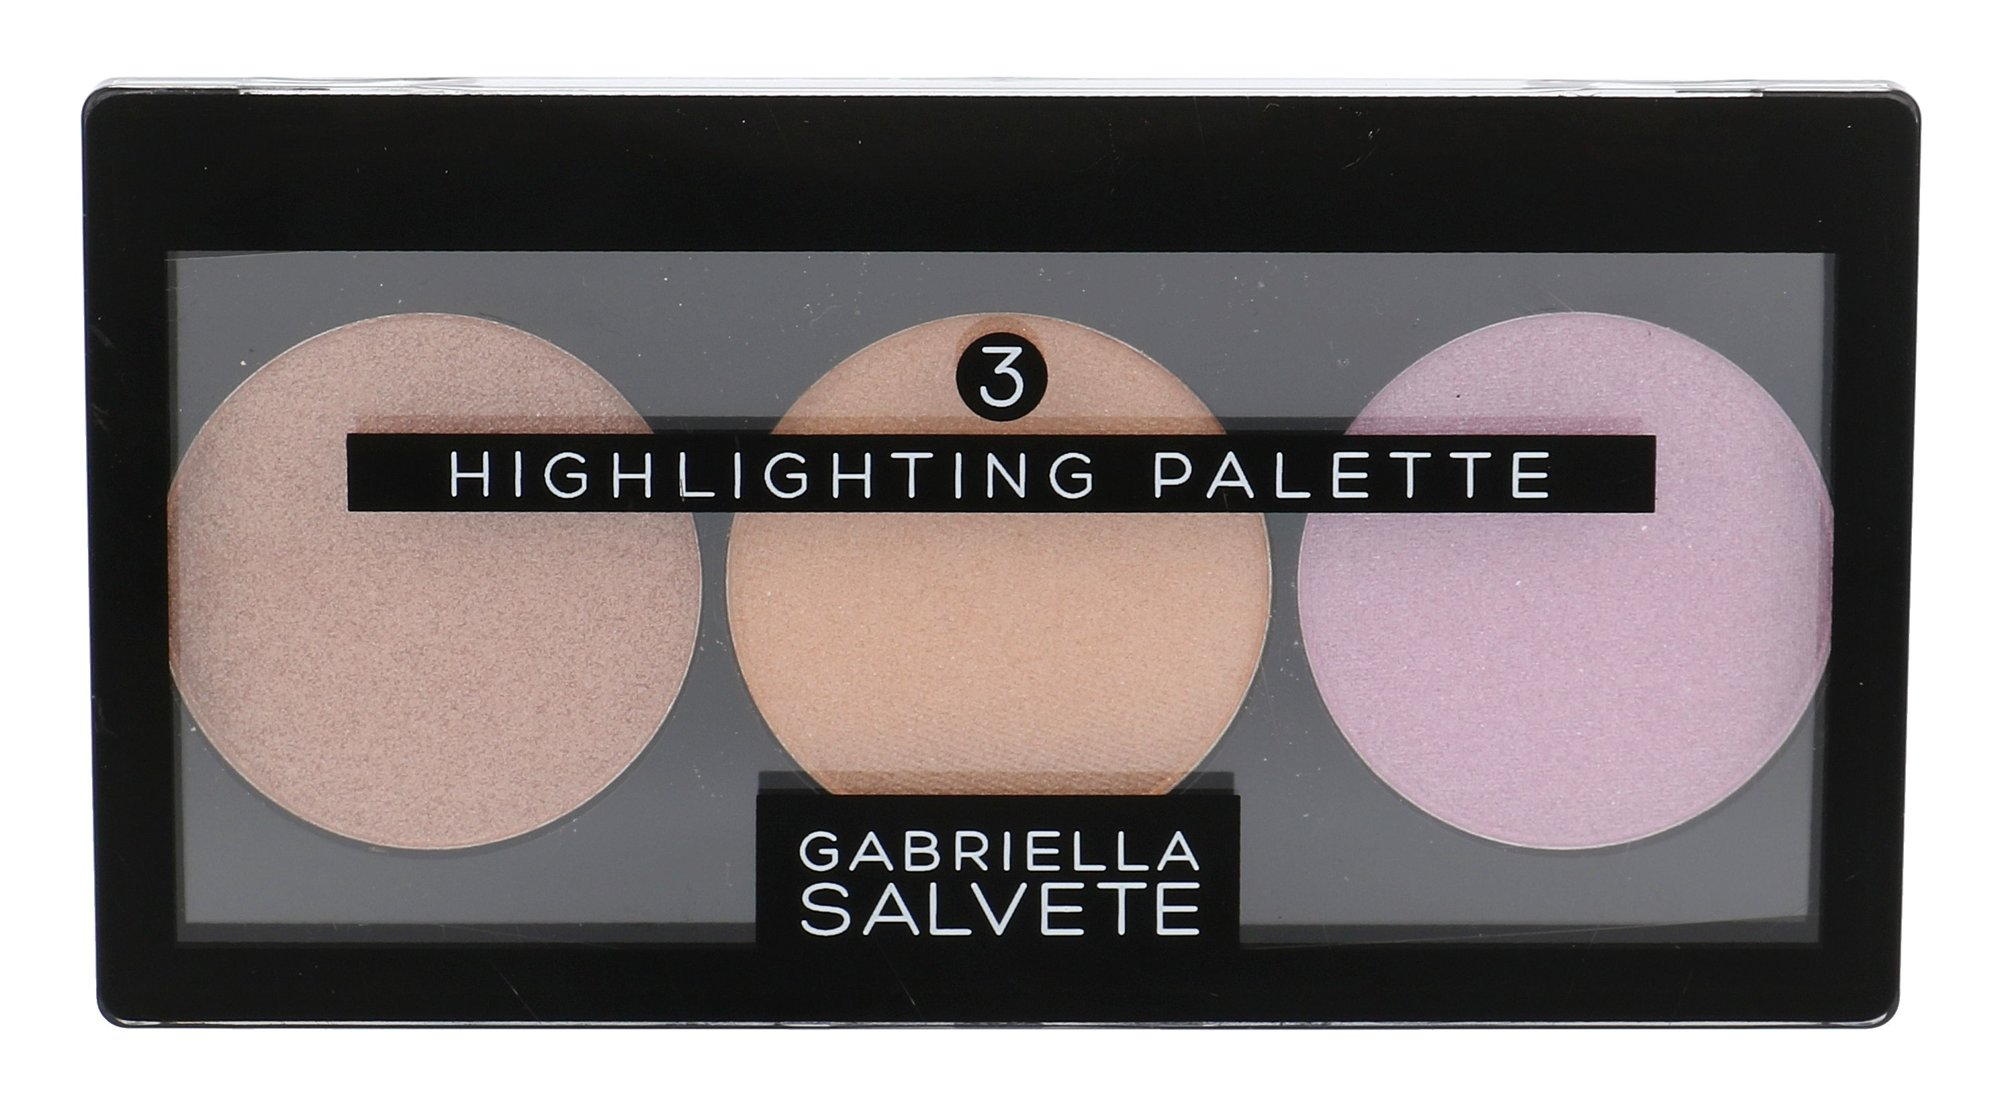 Gabriella Salvete Highlighting Palette Cosmetic 15g